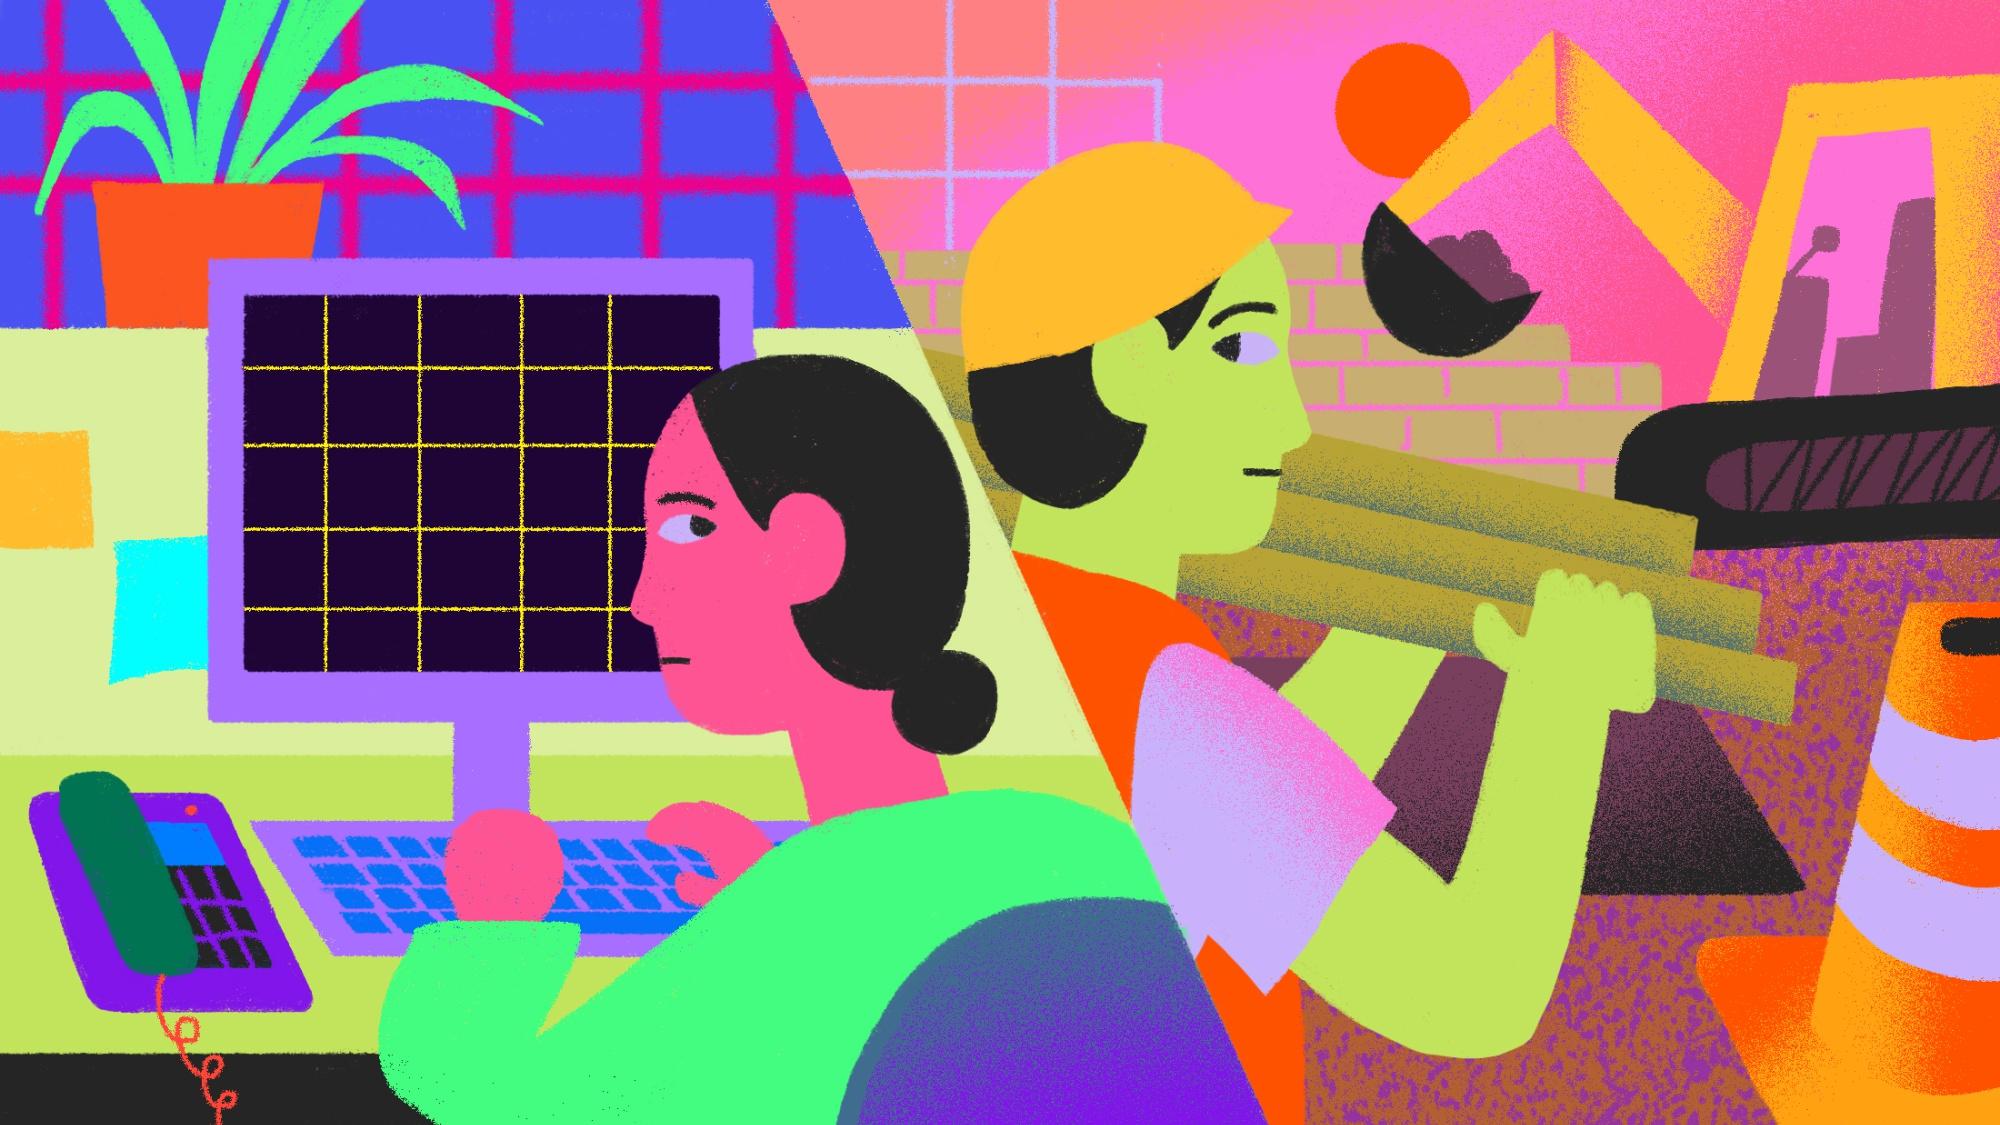 Multinational Companies Reveal Gender Bias in Job Ads